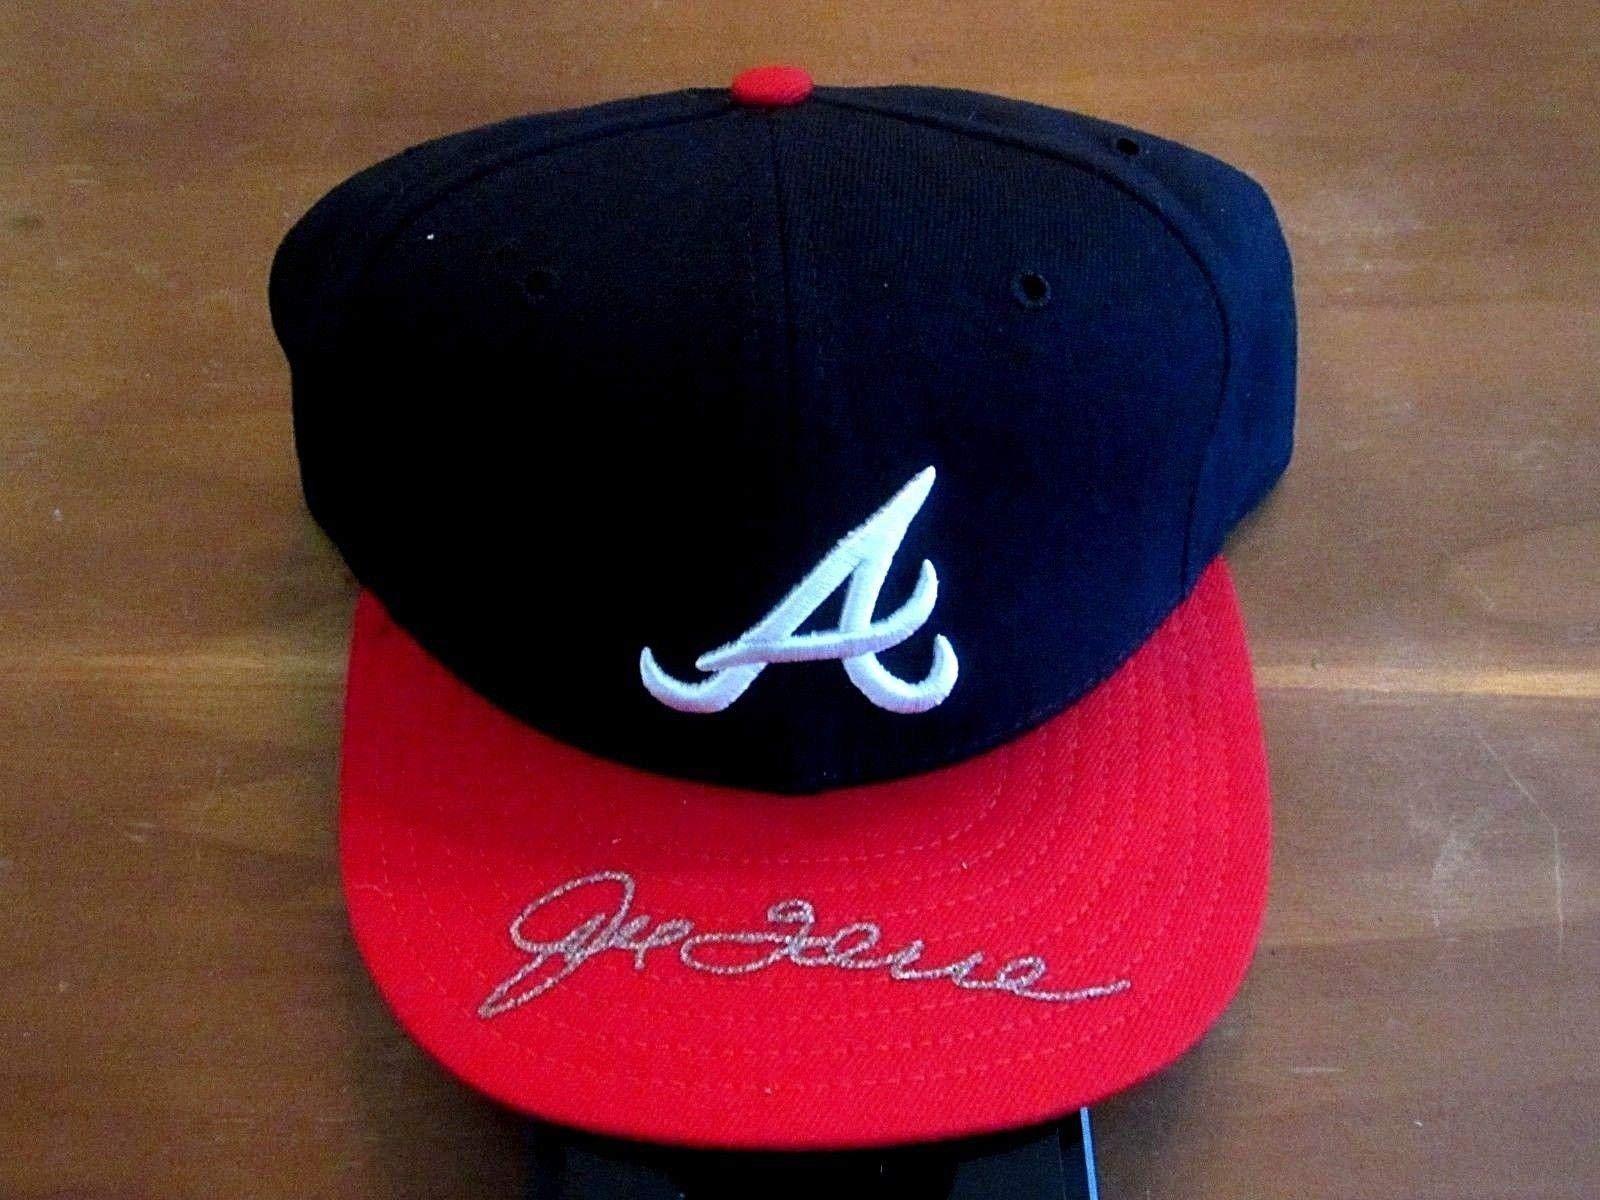 Joe Torre Gold Glove Winner Hof Braves Yankee Signed Auto New Era Cap JSA Certified Autographed Hats